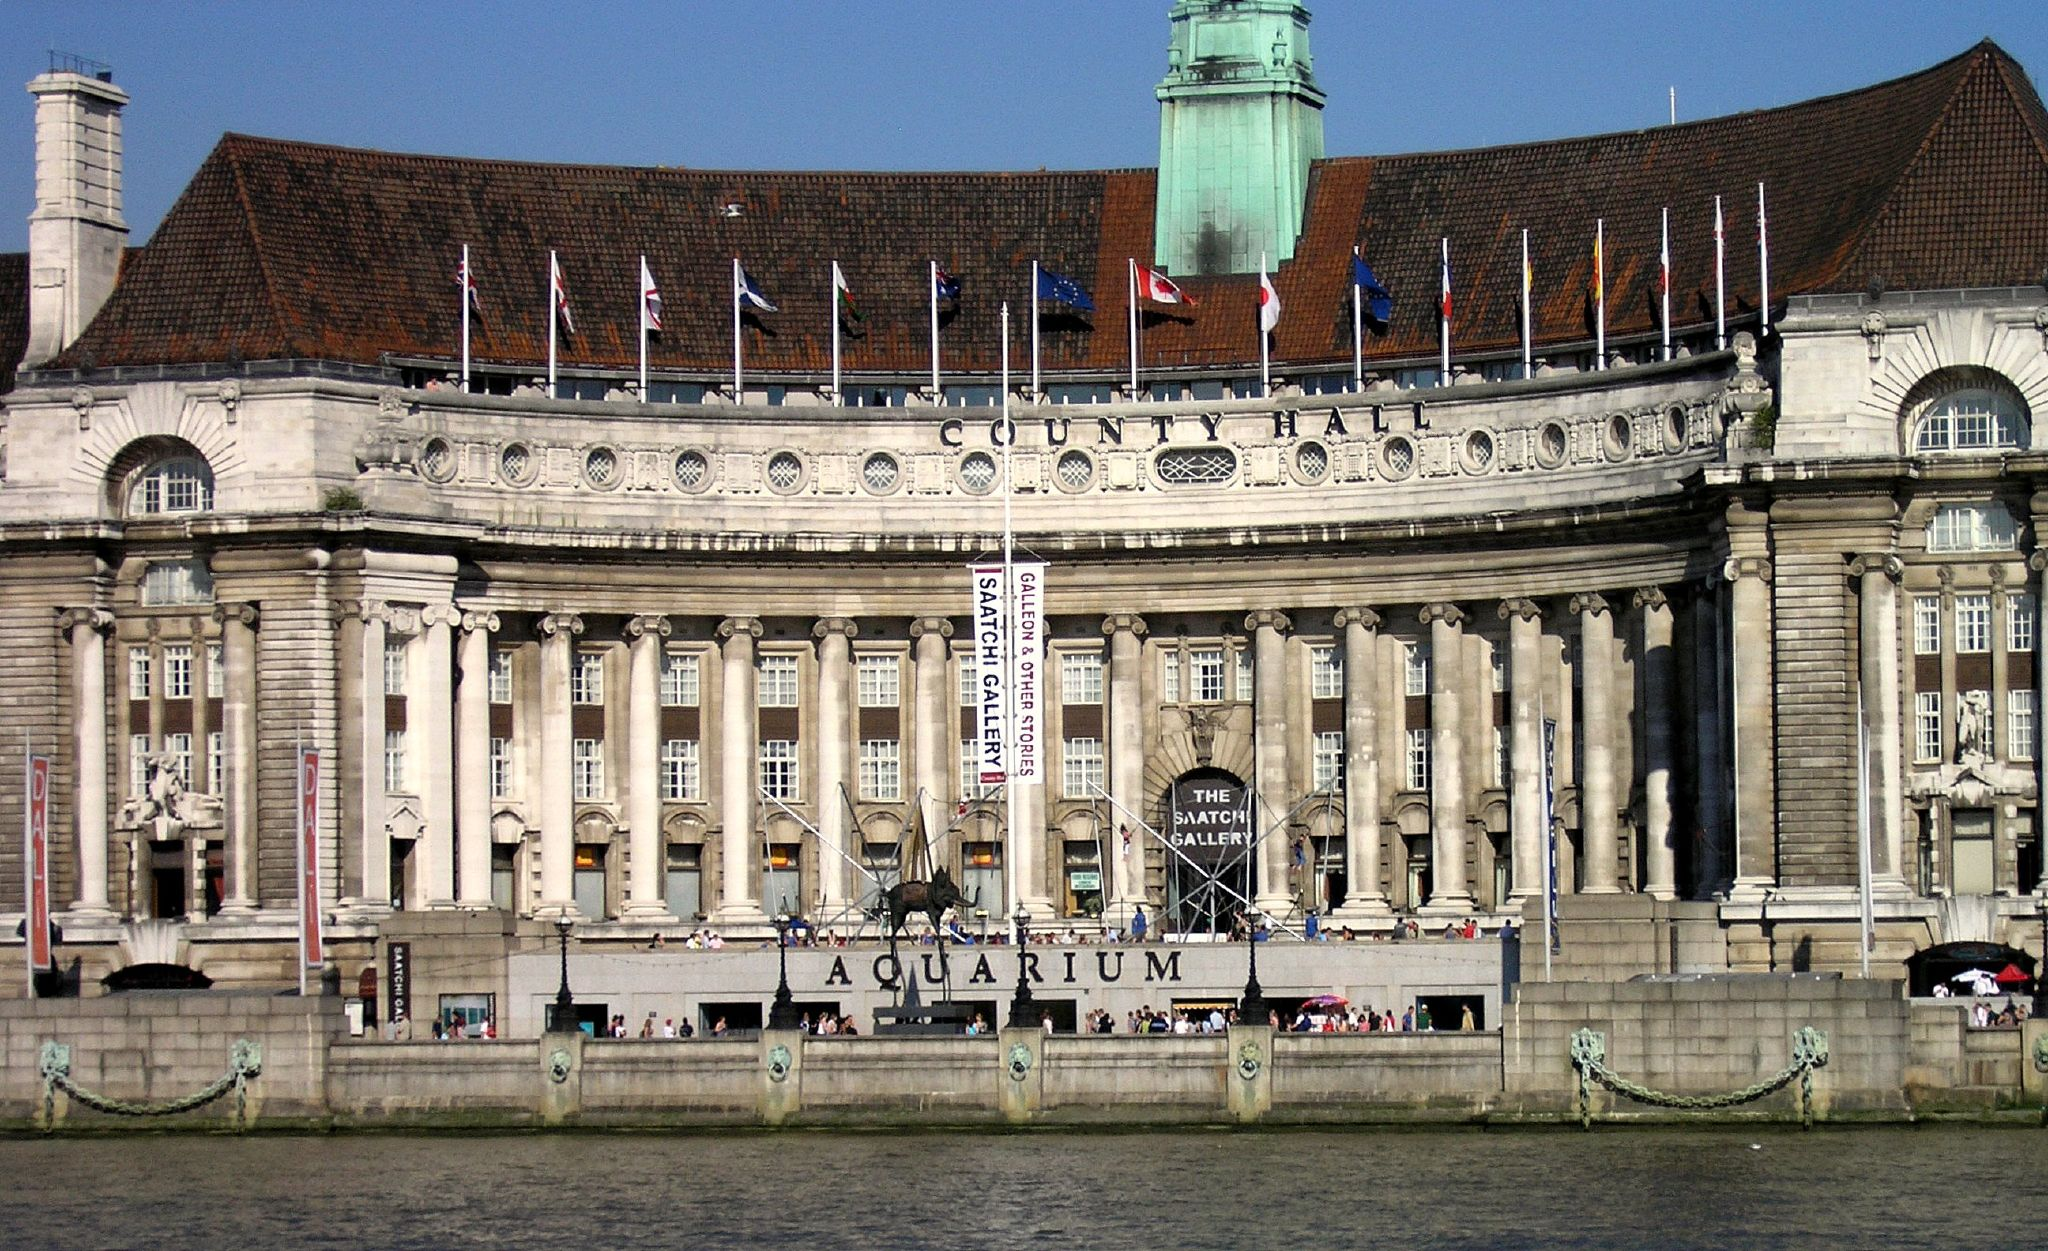 File Saatchi Gallery And London Aquarium County Hall Photo